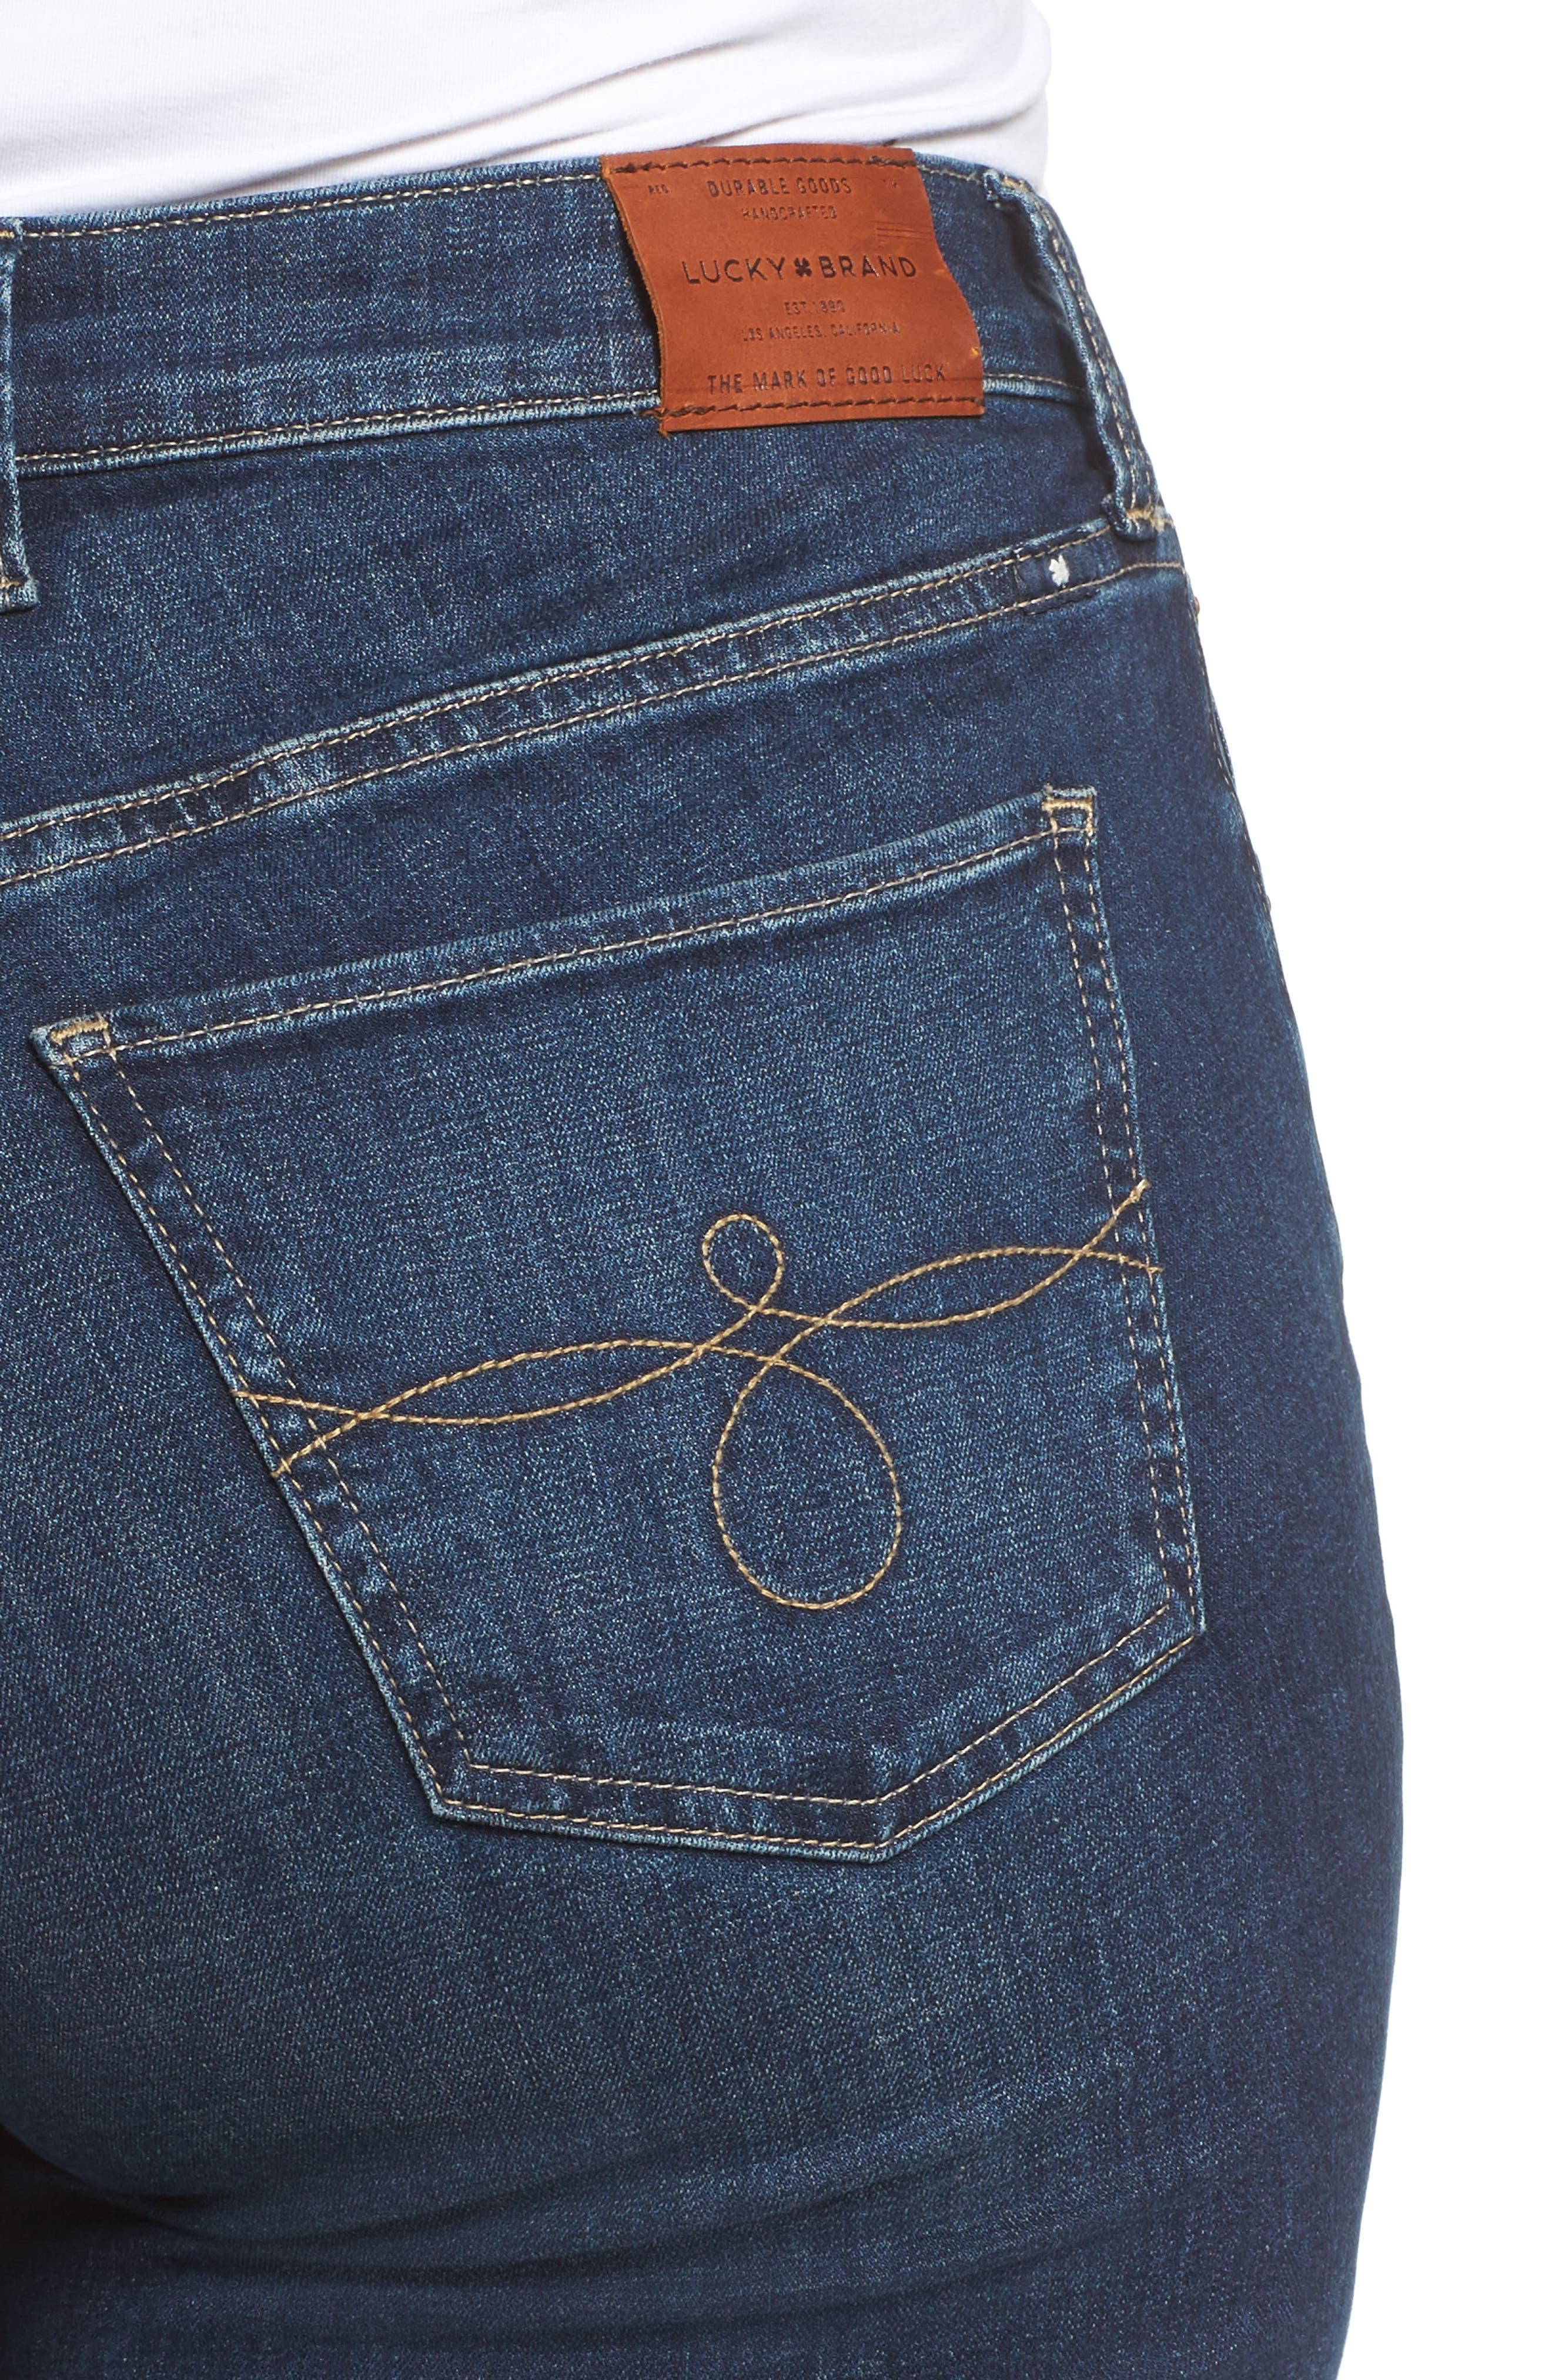 Ginger Bermuda Shorts,                             Alternate thumbnail 4, color,                             Marana-P